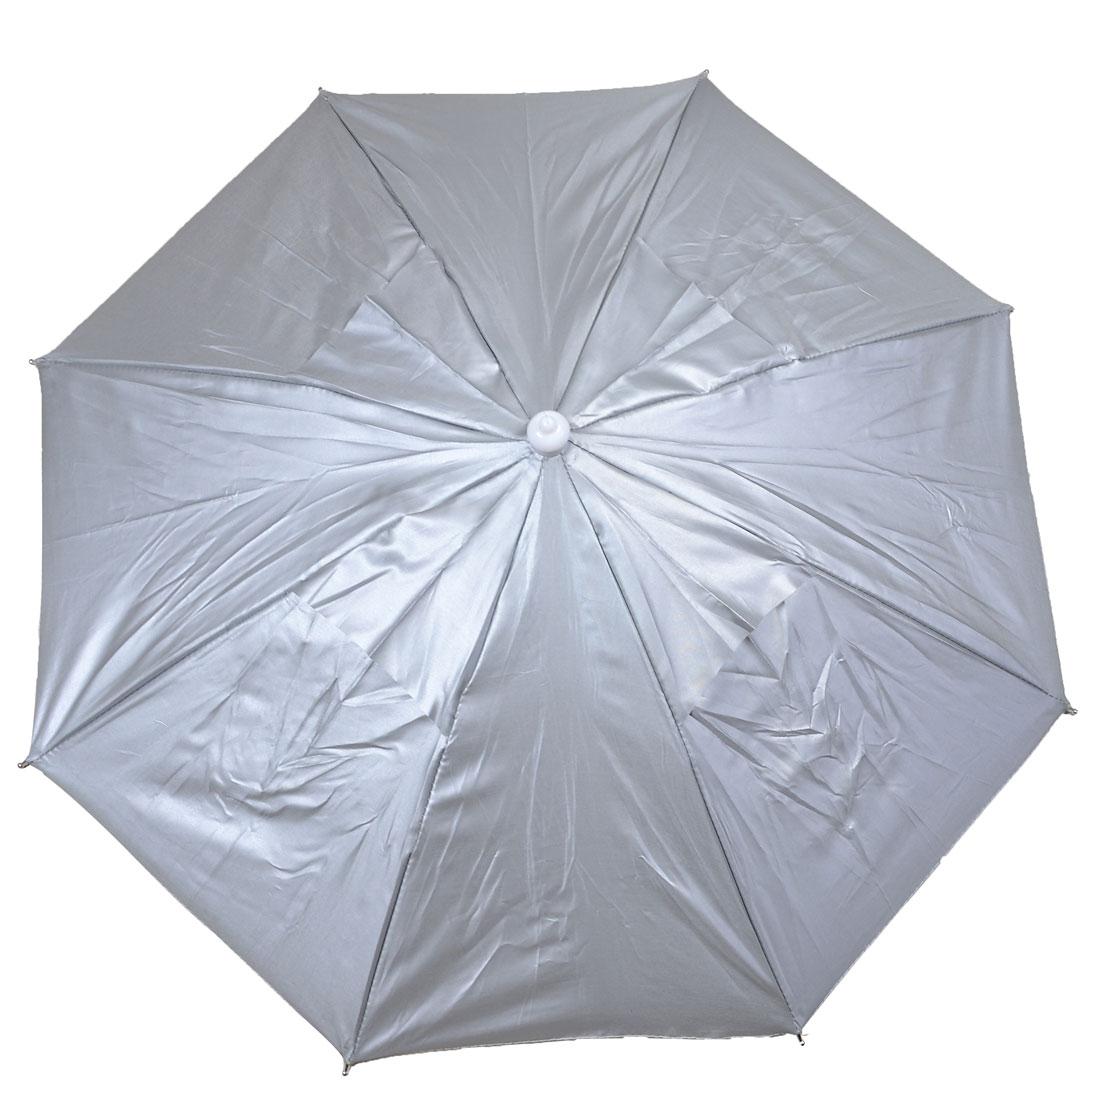 Silver Tone Hands Free Metal Frame Folding Fishing Umbrella Hat